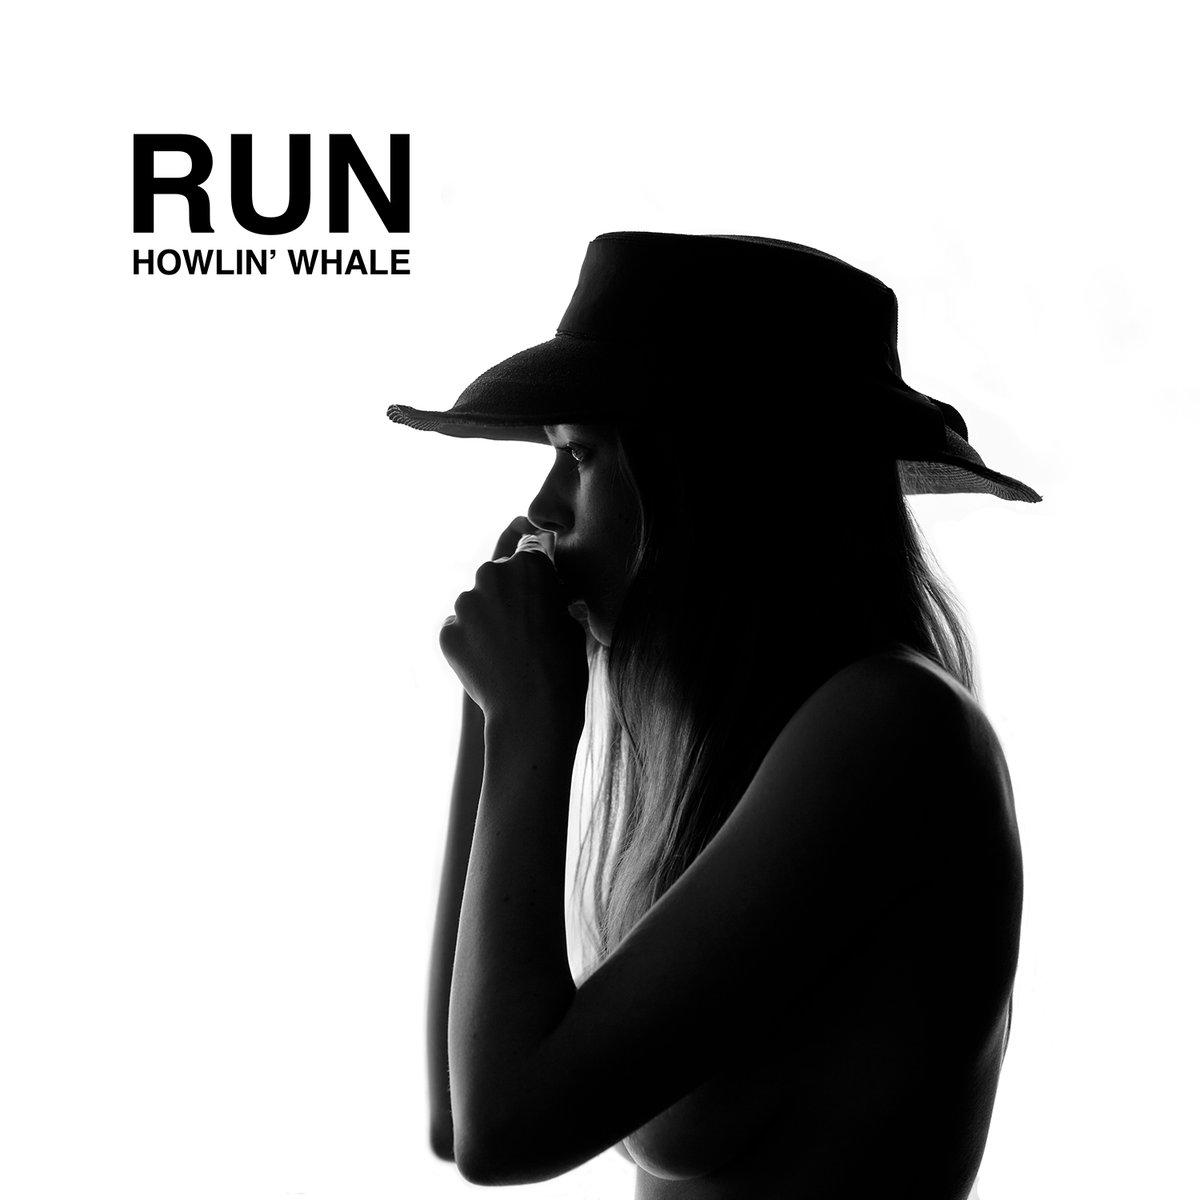 run_howlin_whale_gypsypop_cover_art.jpg